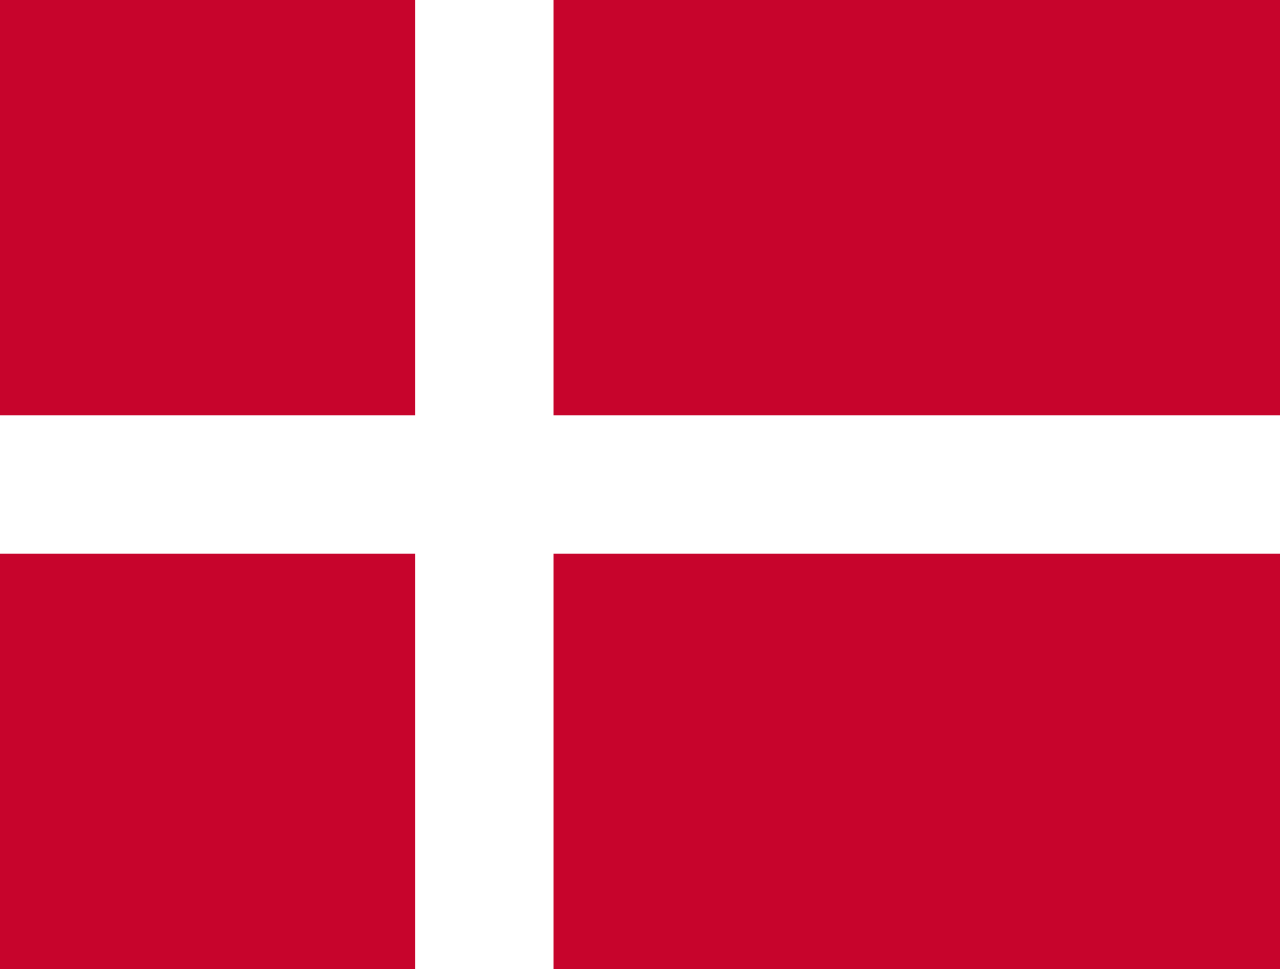 dk-flagge.png